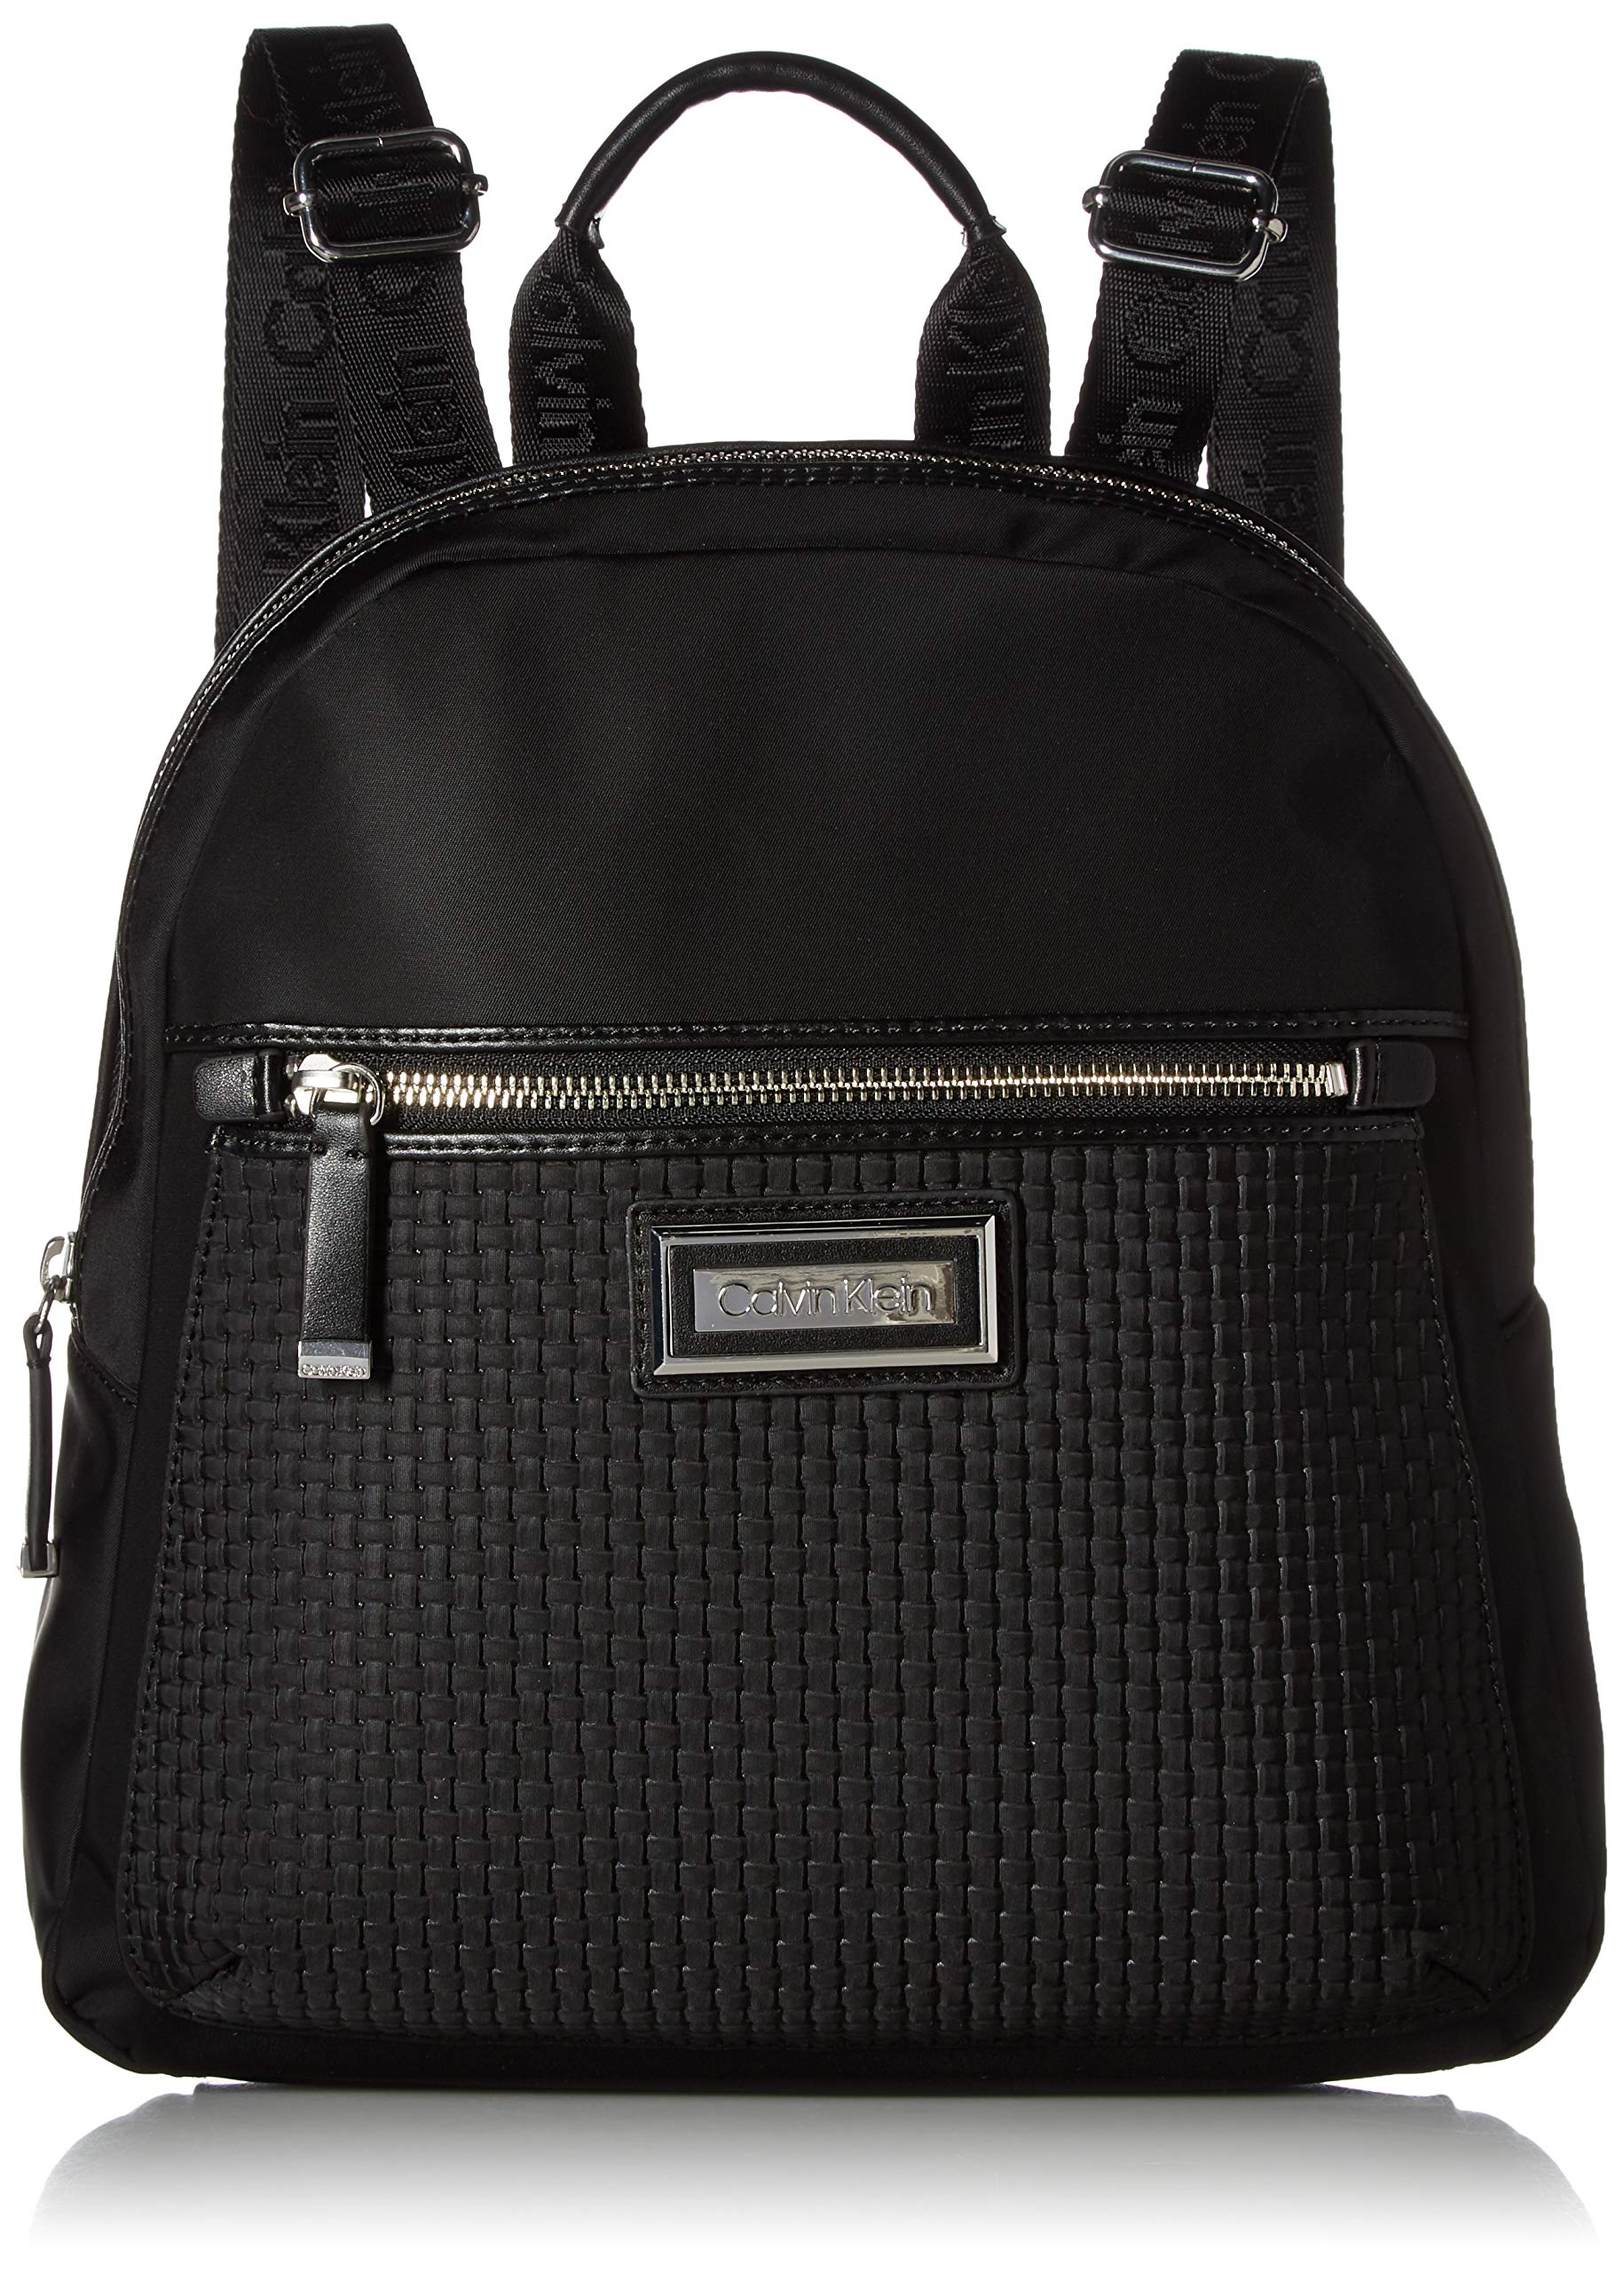 Calvin Klein Belfast Woven Nylon Novelty Key Item Backpack, black/silver, One Size